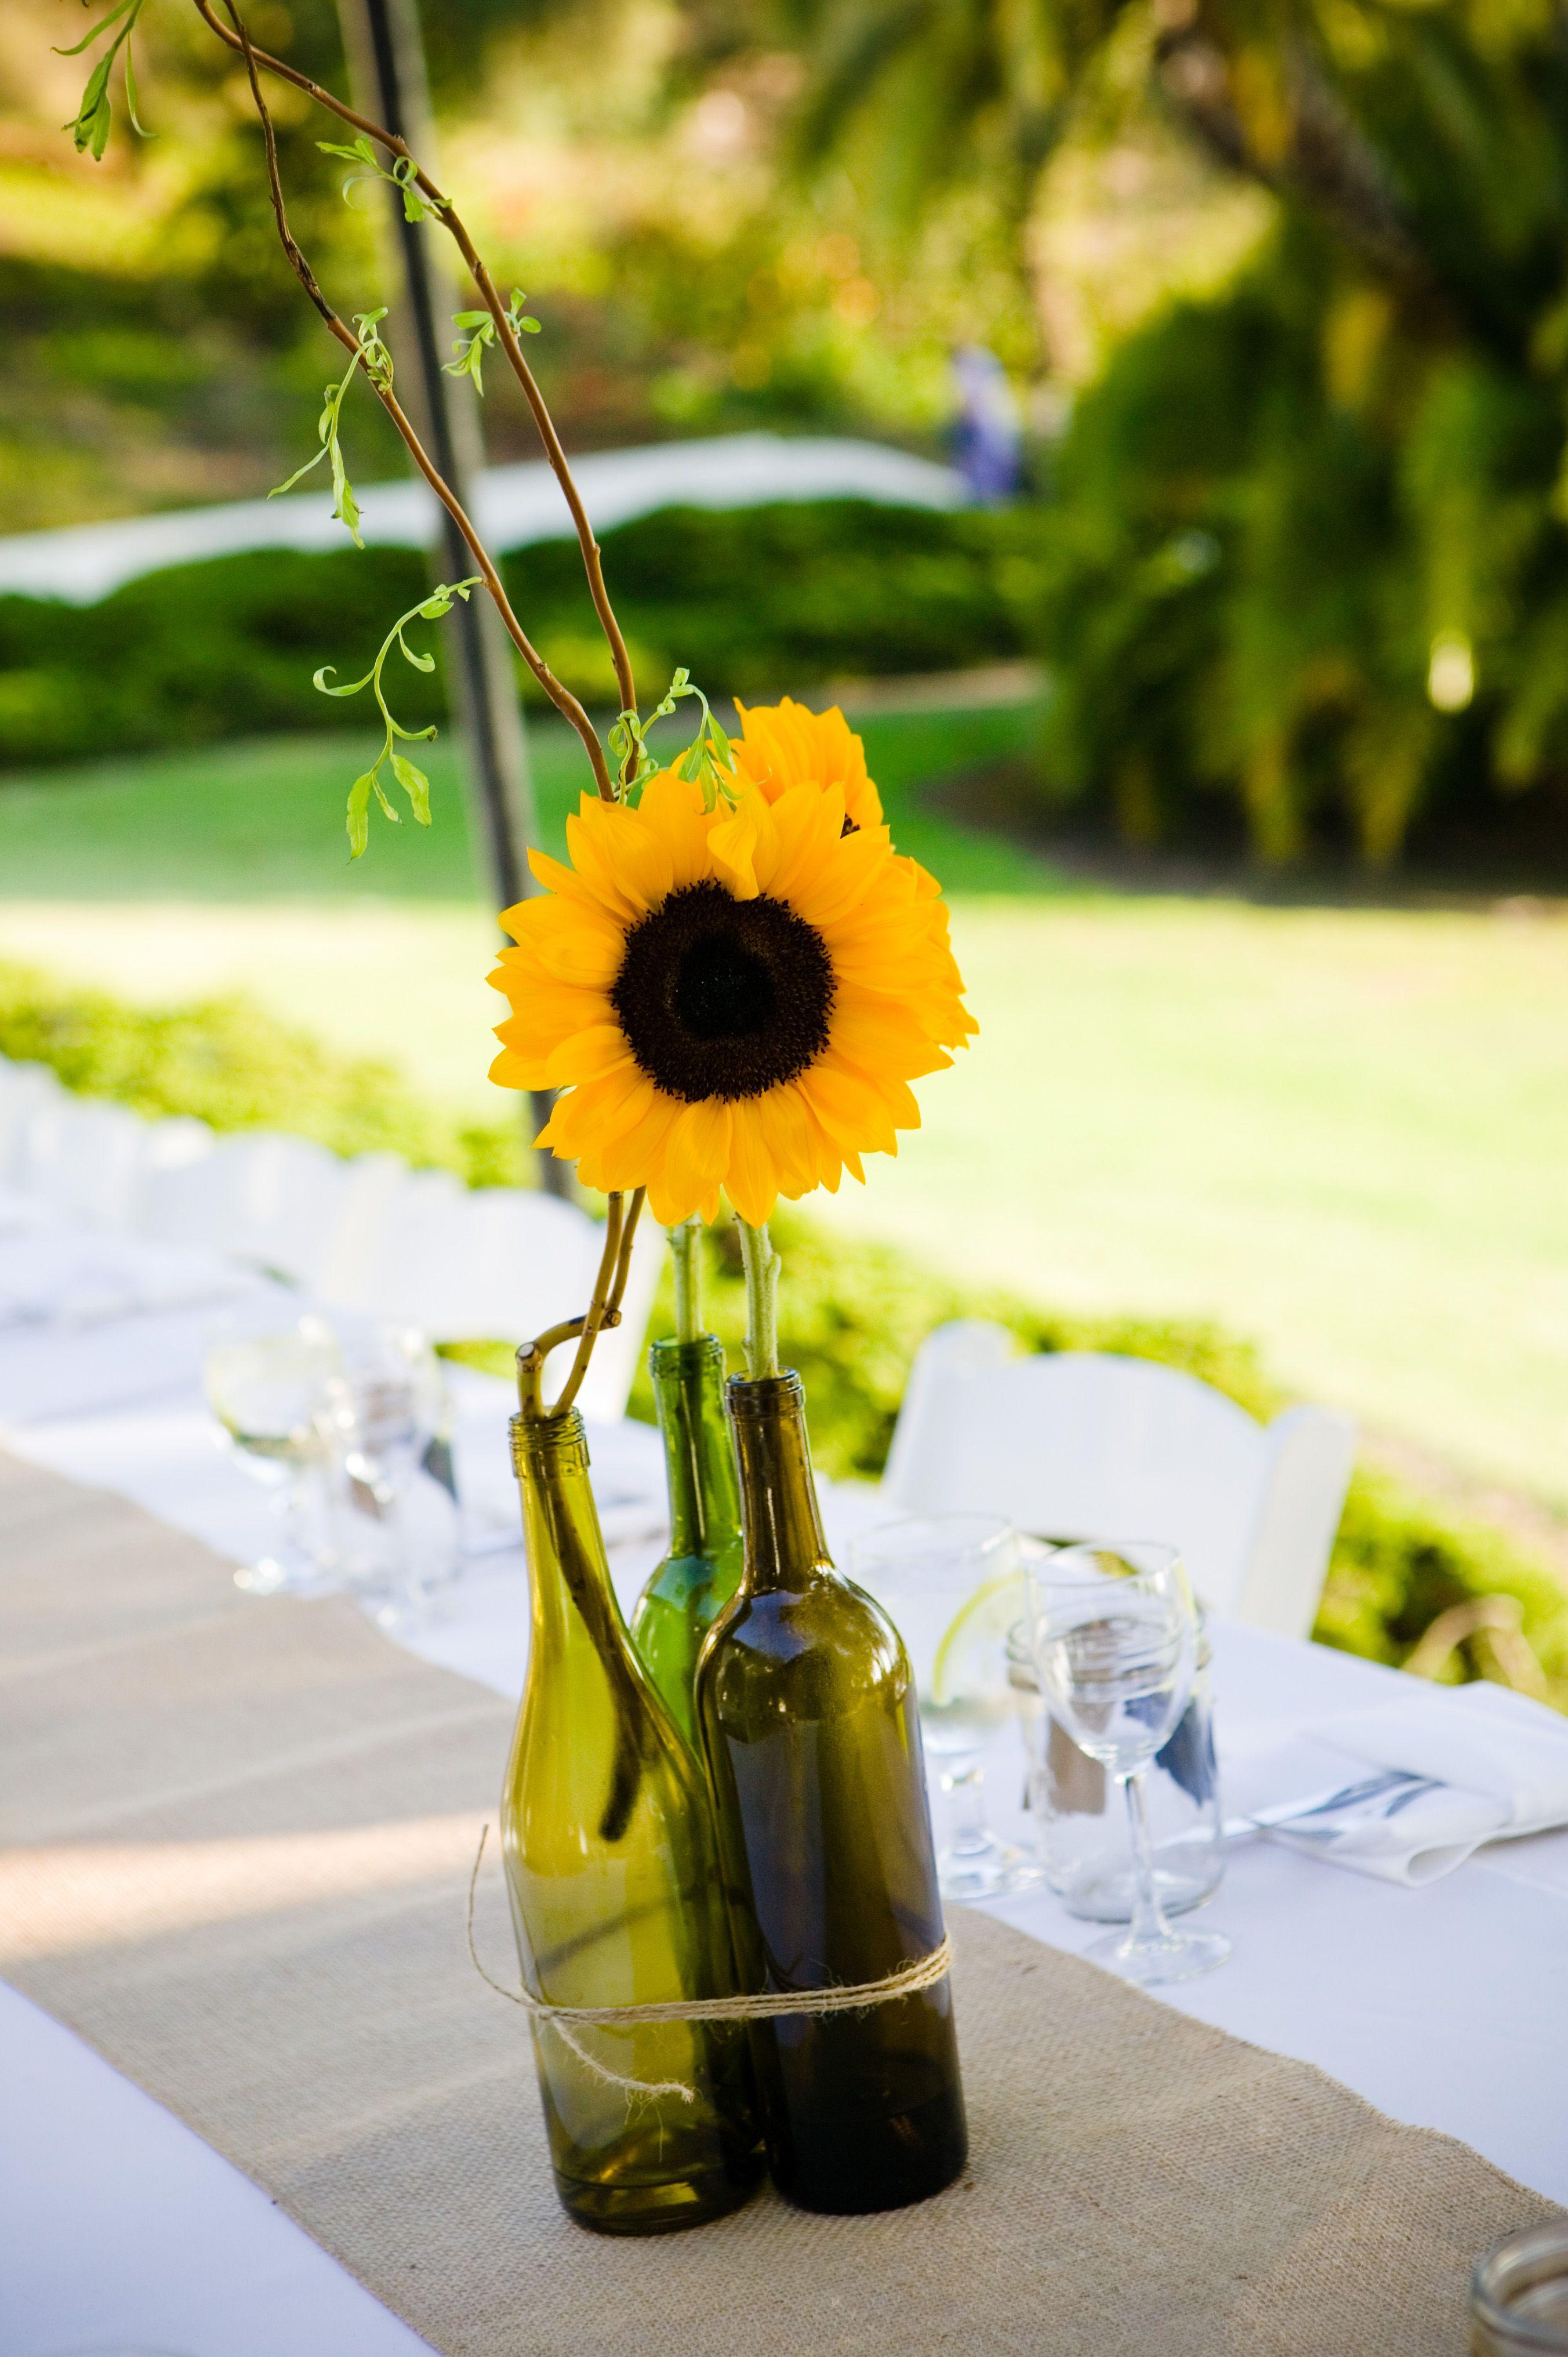 Sunflower And Wine Bottle Centerpiece For Rustic Wedding Diy Sunflowers Rusticwedding